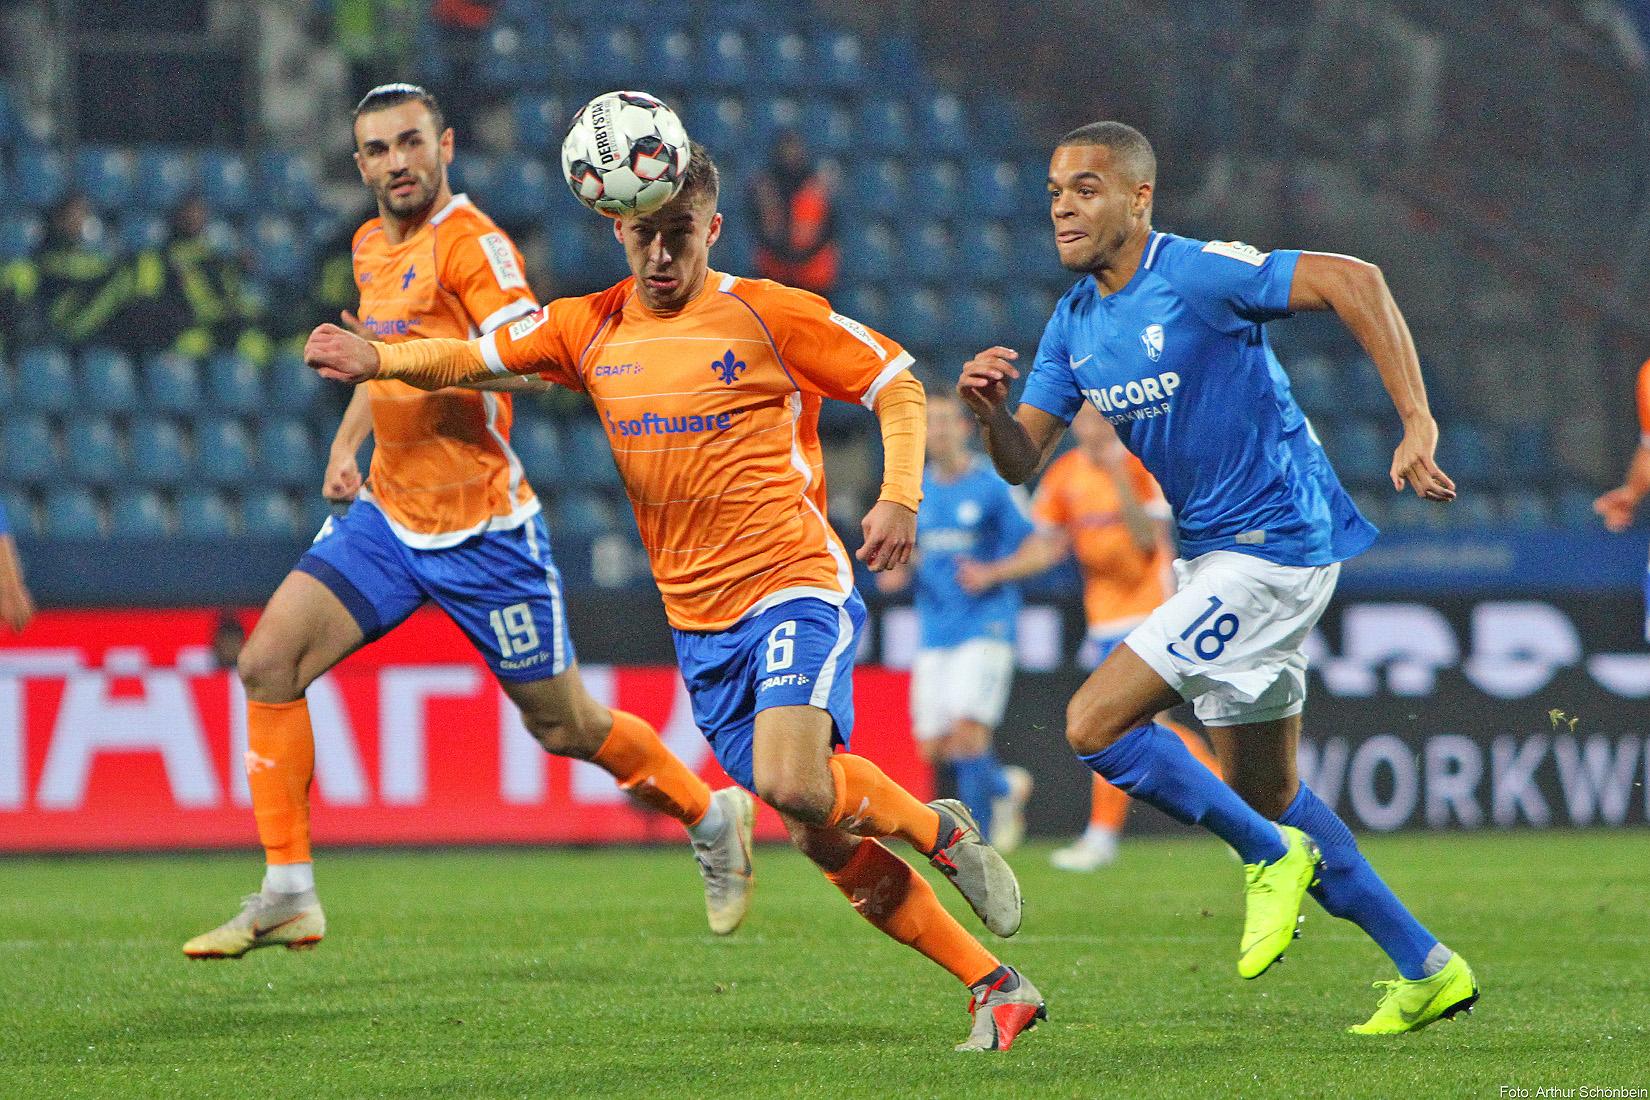 VfL Bochum – SV Darmstadt 98 1:0 (0:0)